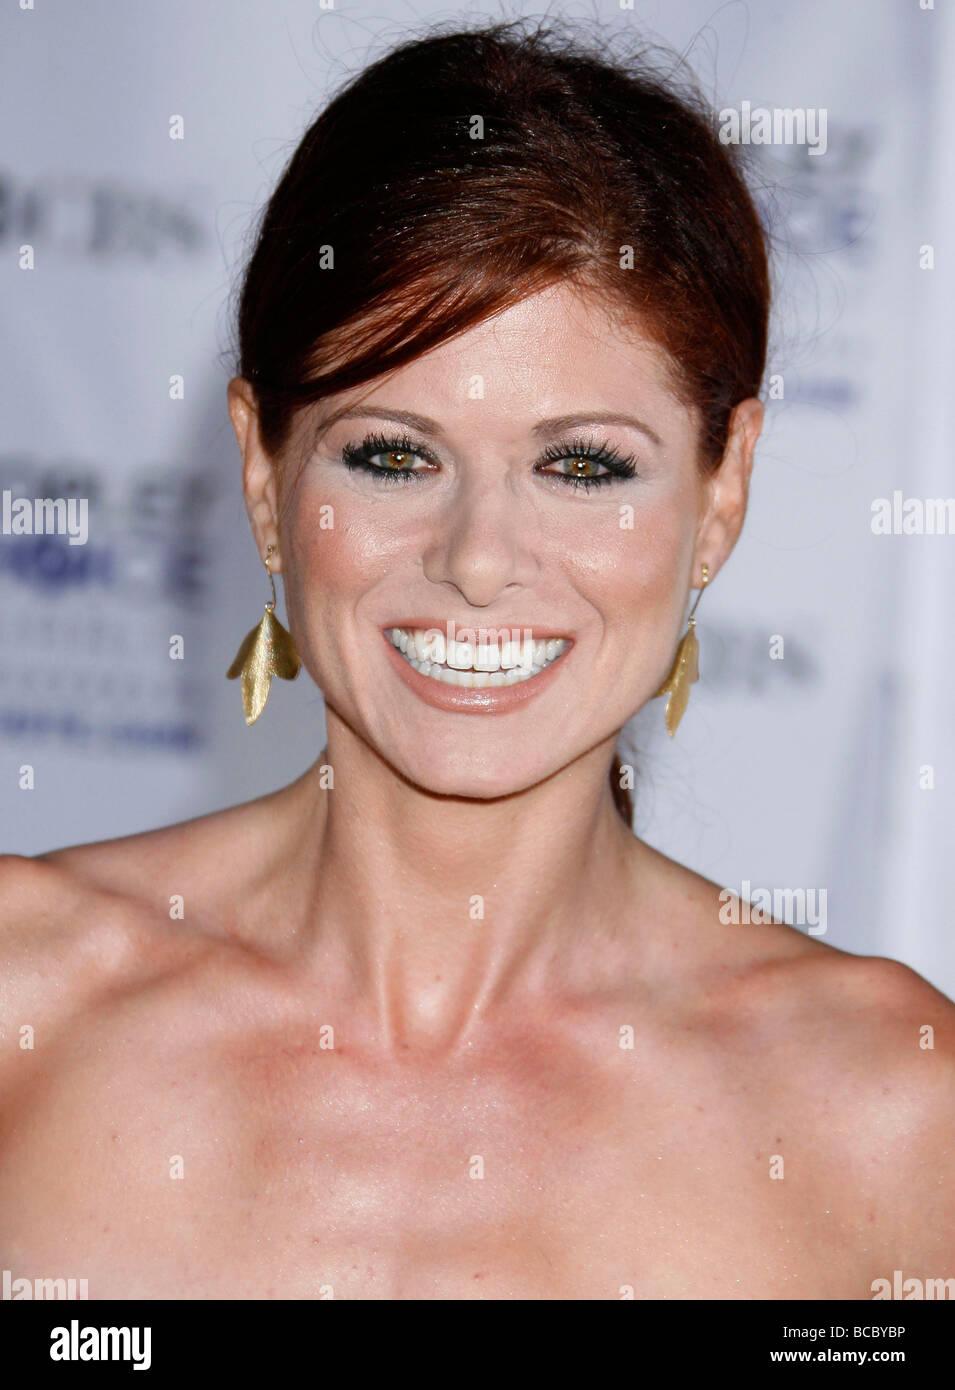 DEBRA MESSING - US film actress in 2009 - Stock Image